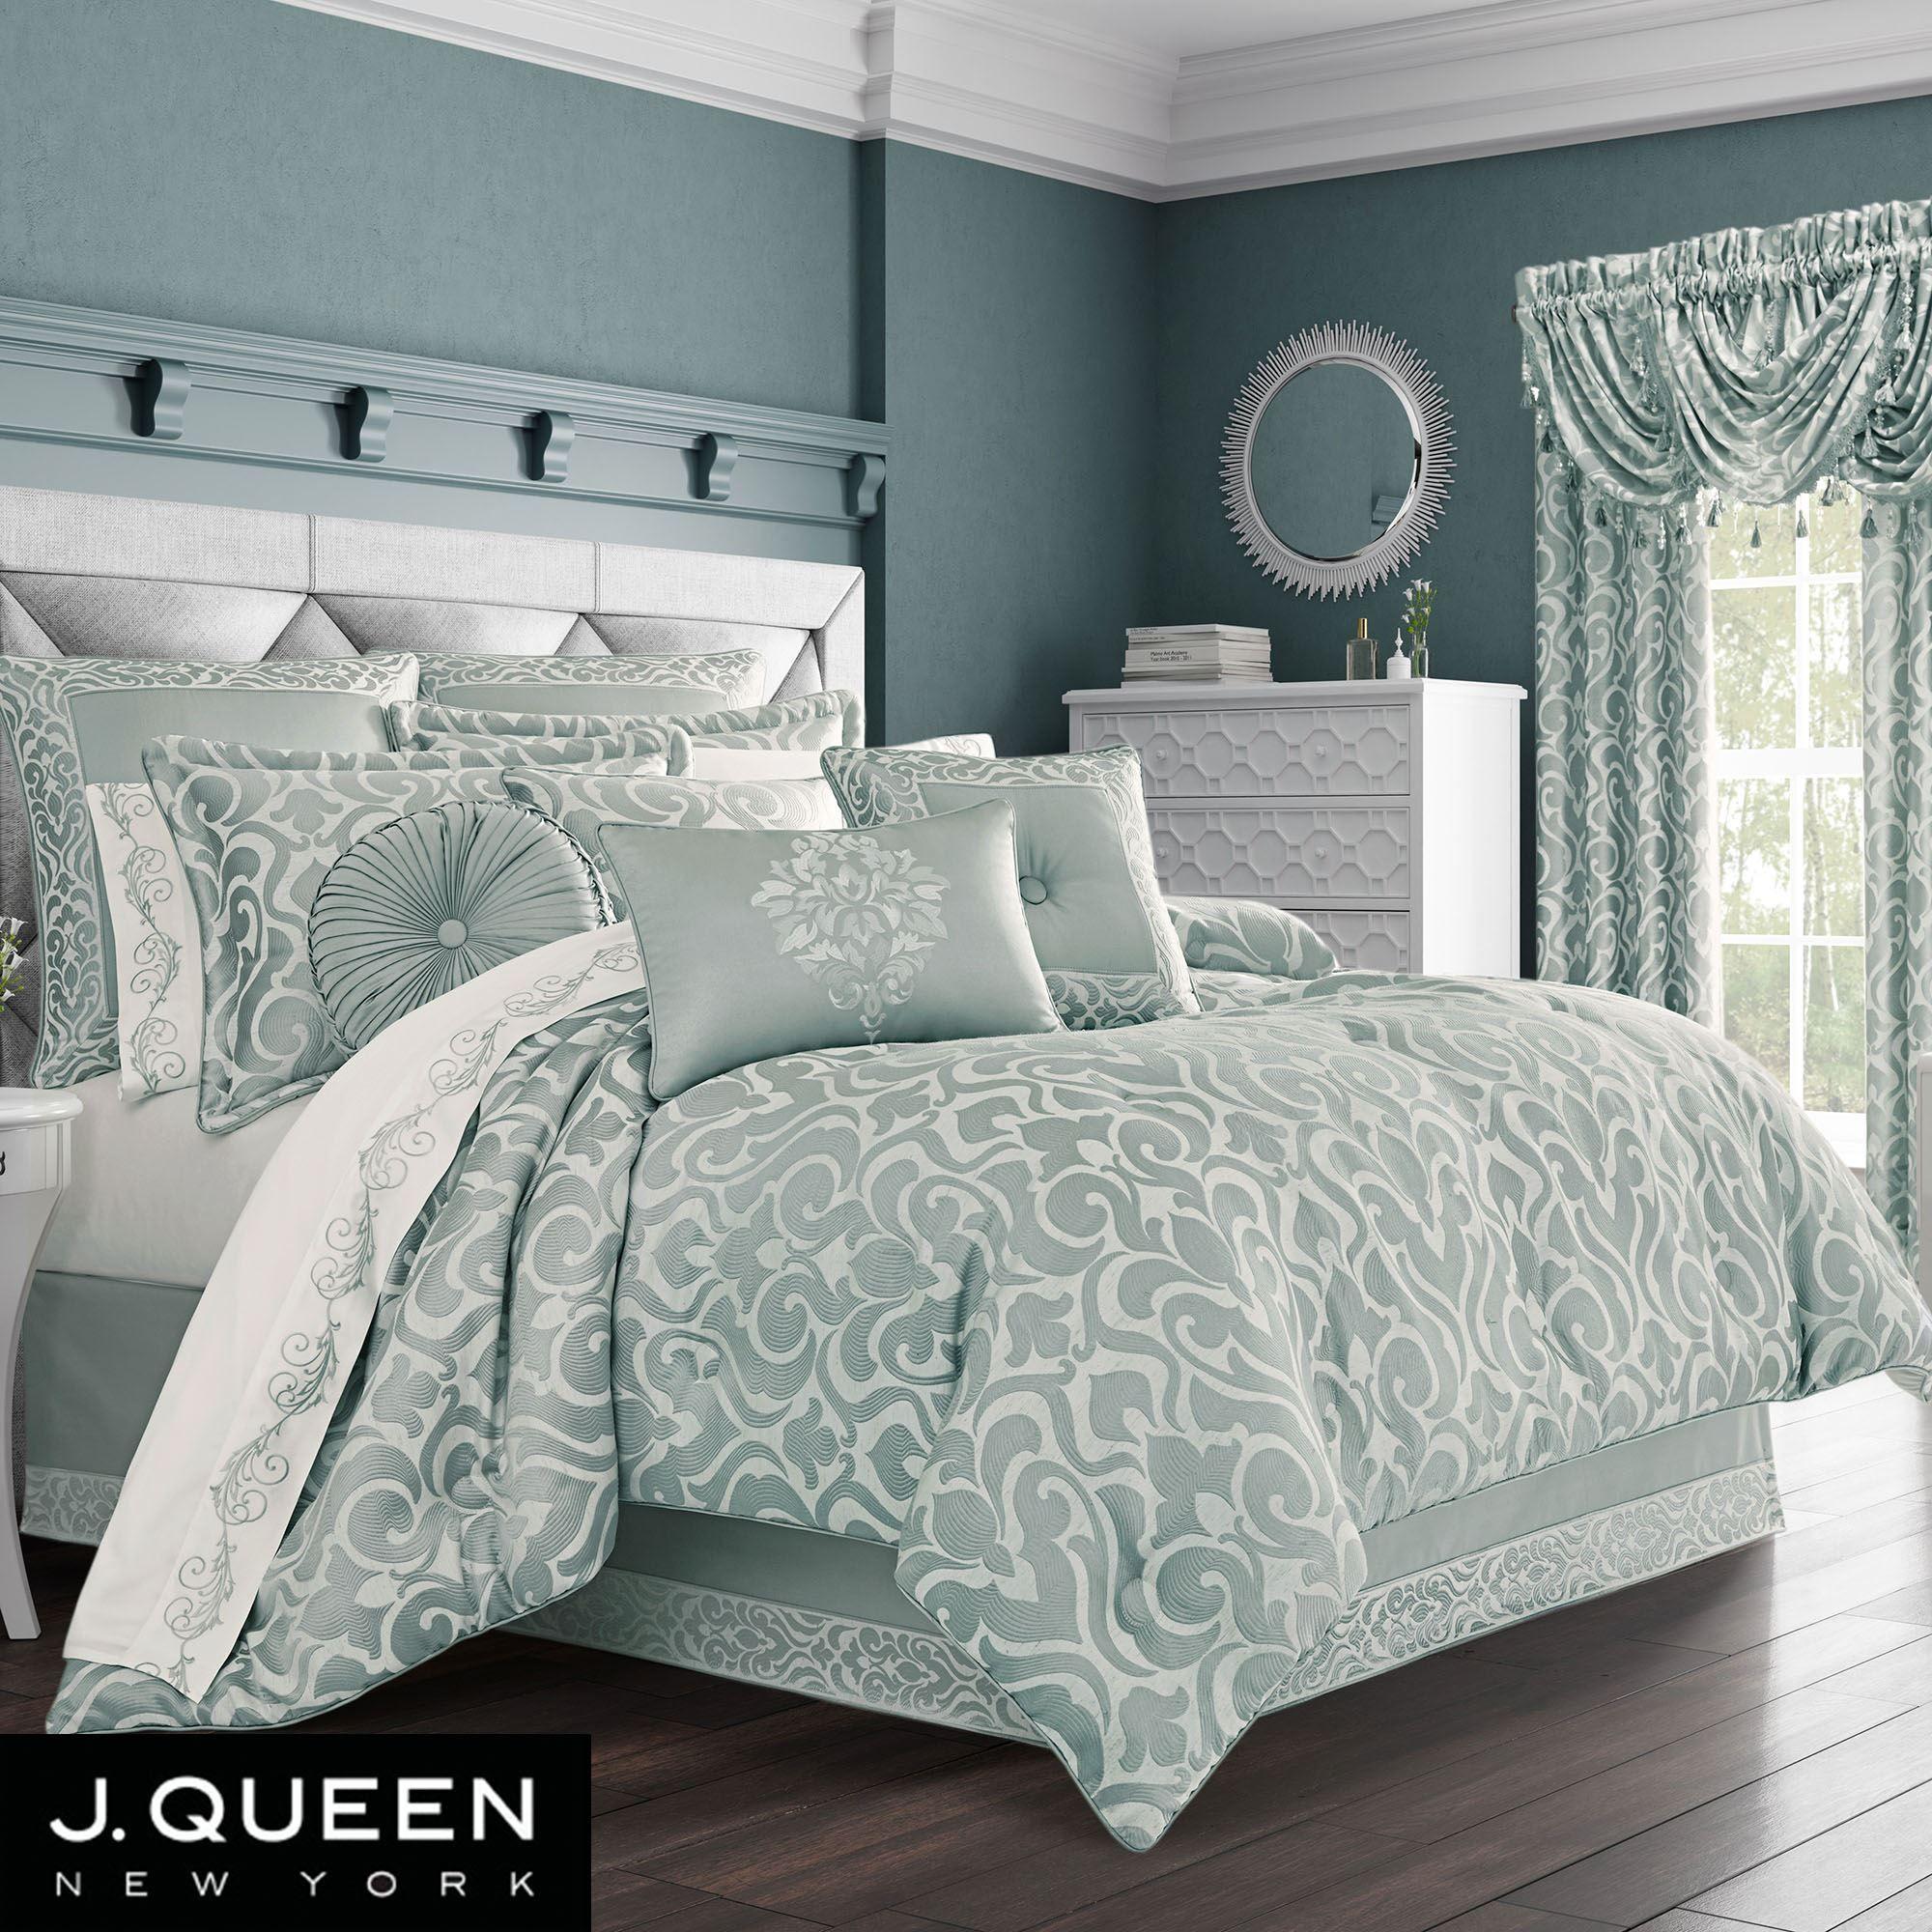 Lombardi Aqua Mist Damask Comforter Bedding By J Queen New